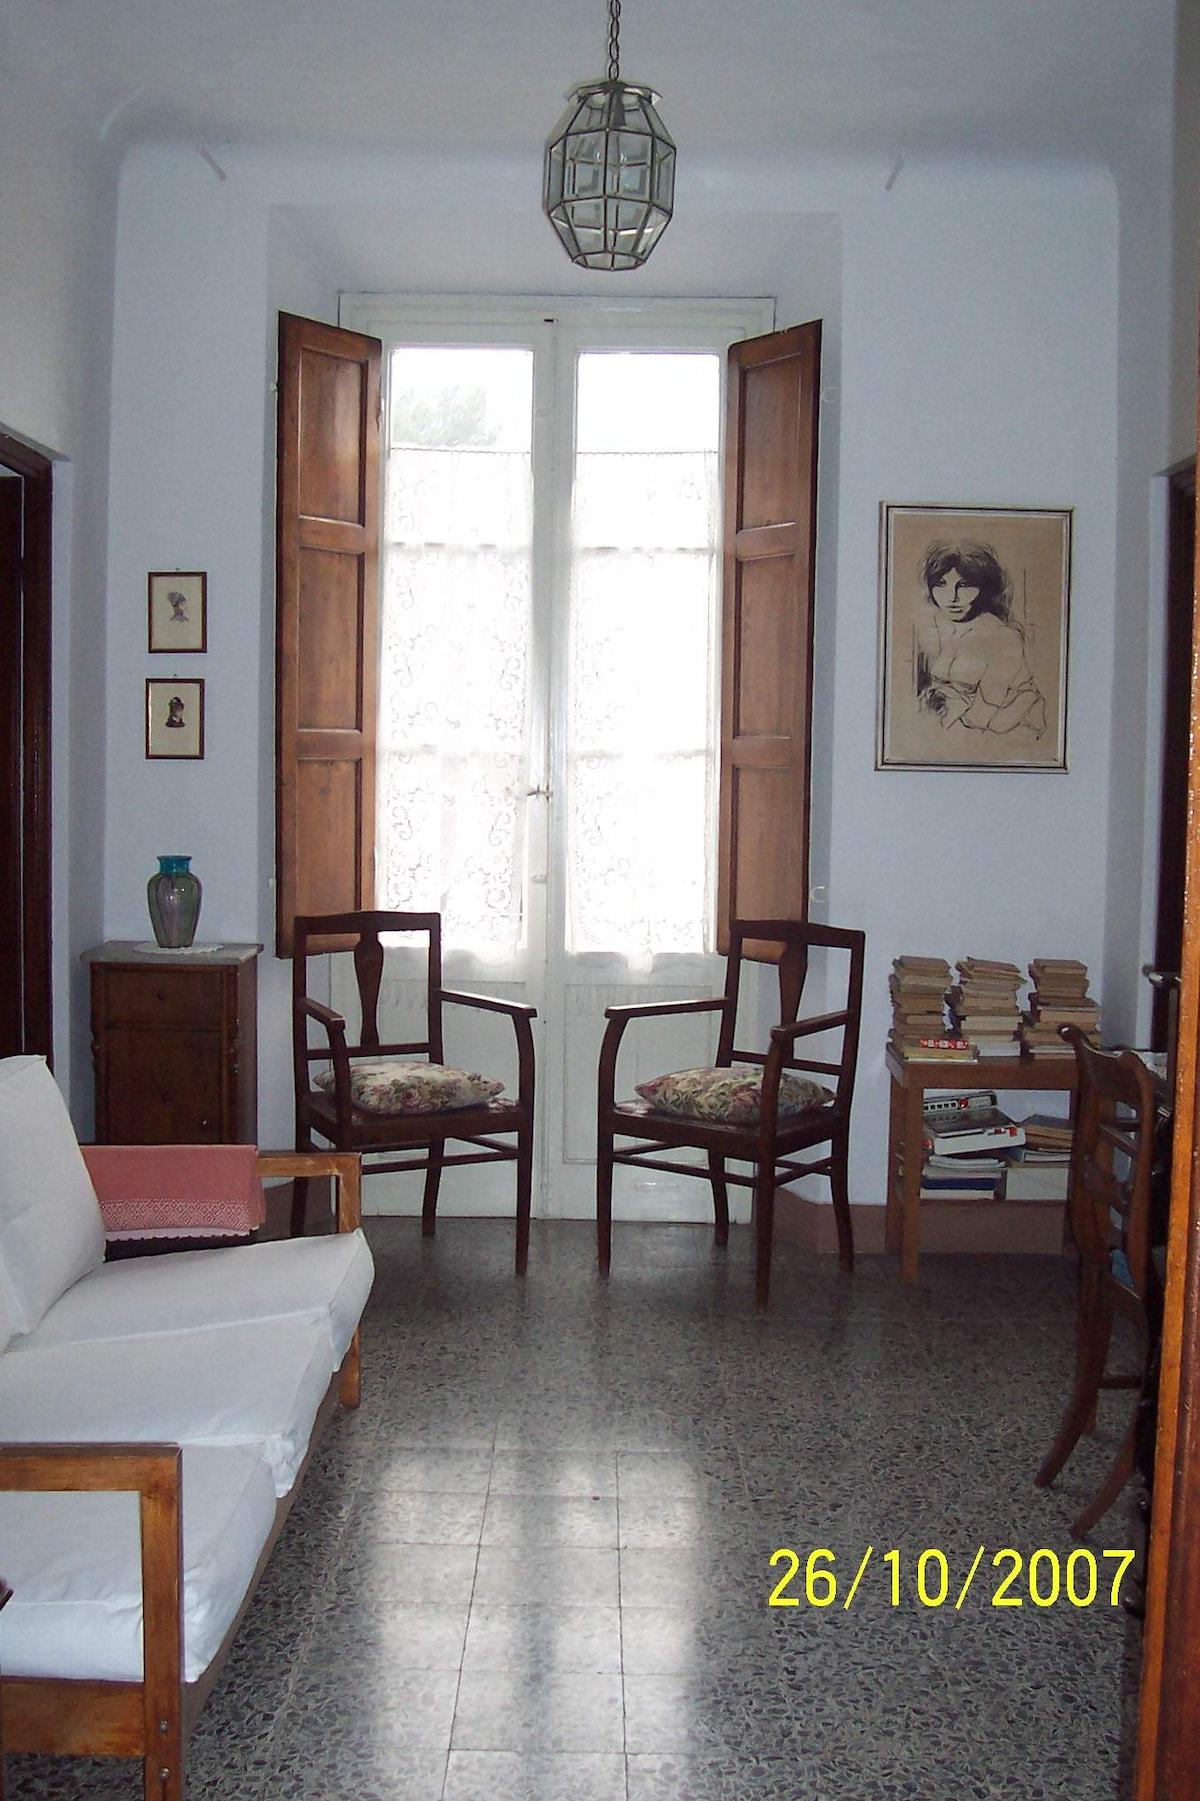 LA MAGNOLIA HOUSE